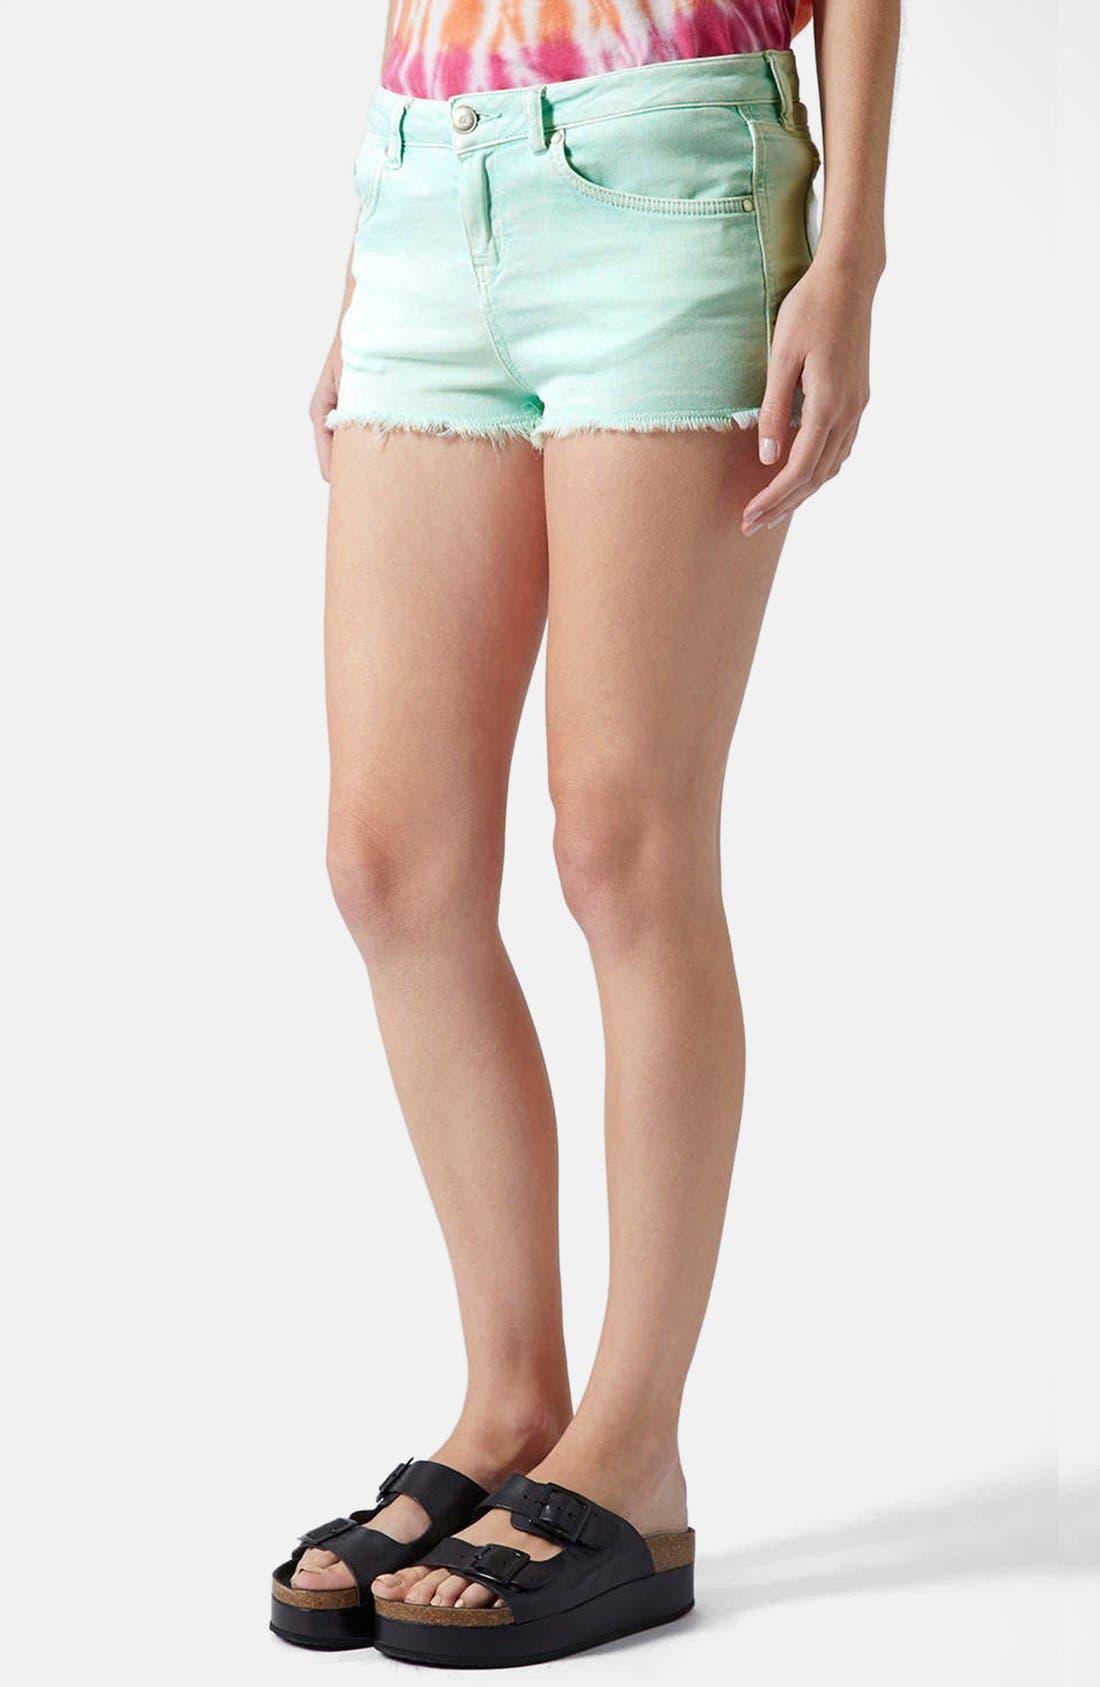 Alternate Image 1 Selected - Topshop Moto 'Daisy' Denim Cutoff Shorts (Mint)